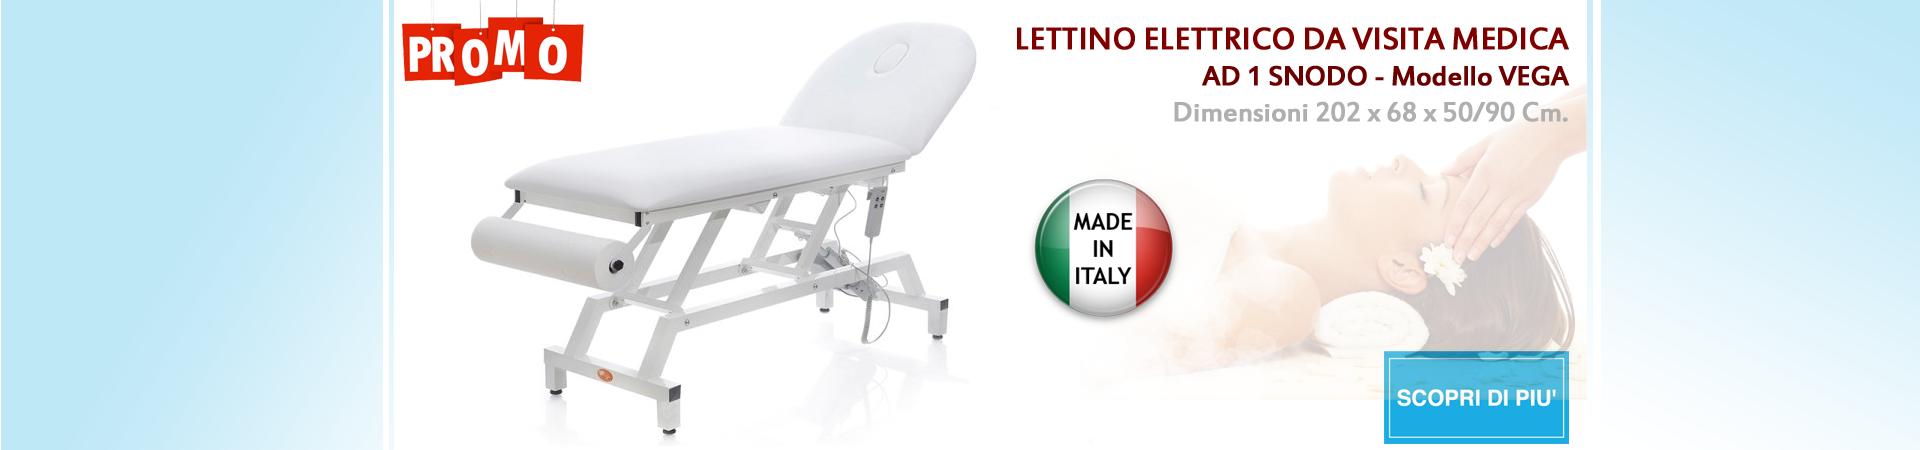 Lettino elettrico Vega Ortopedia | Elettromedicali | Forniture Ospedaliere | Medisanshop.com